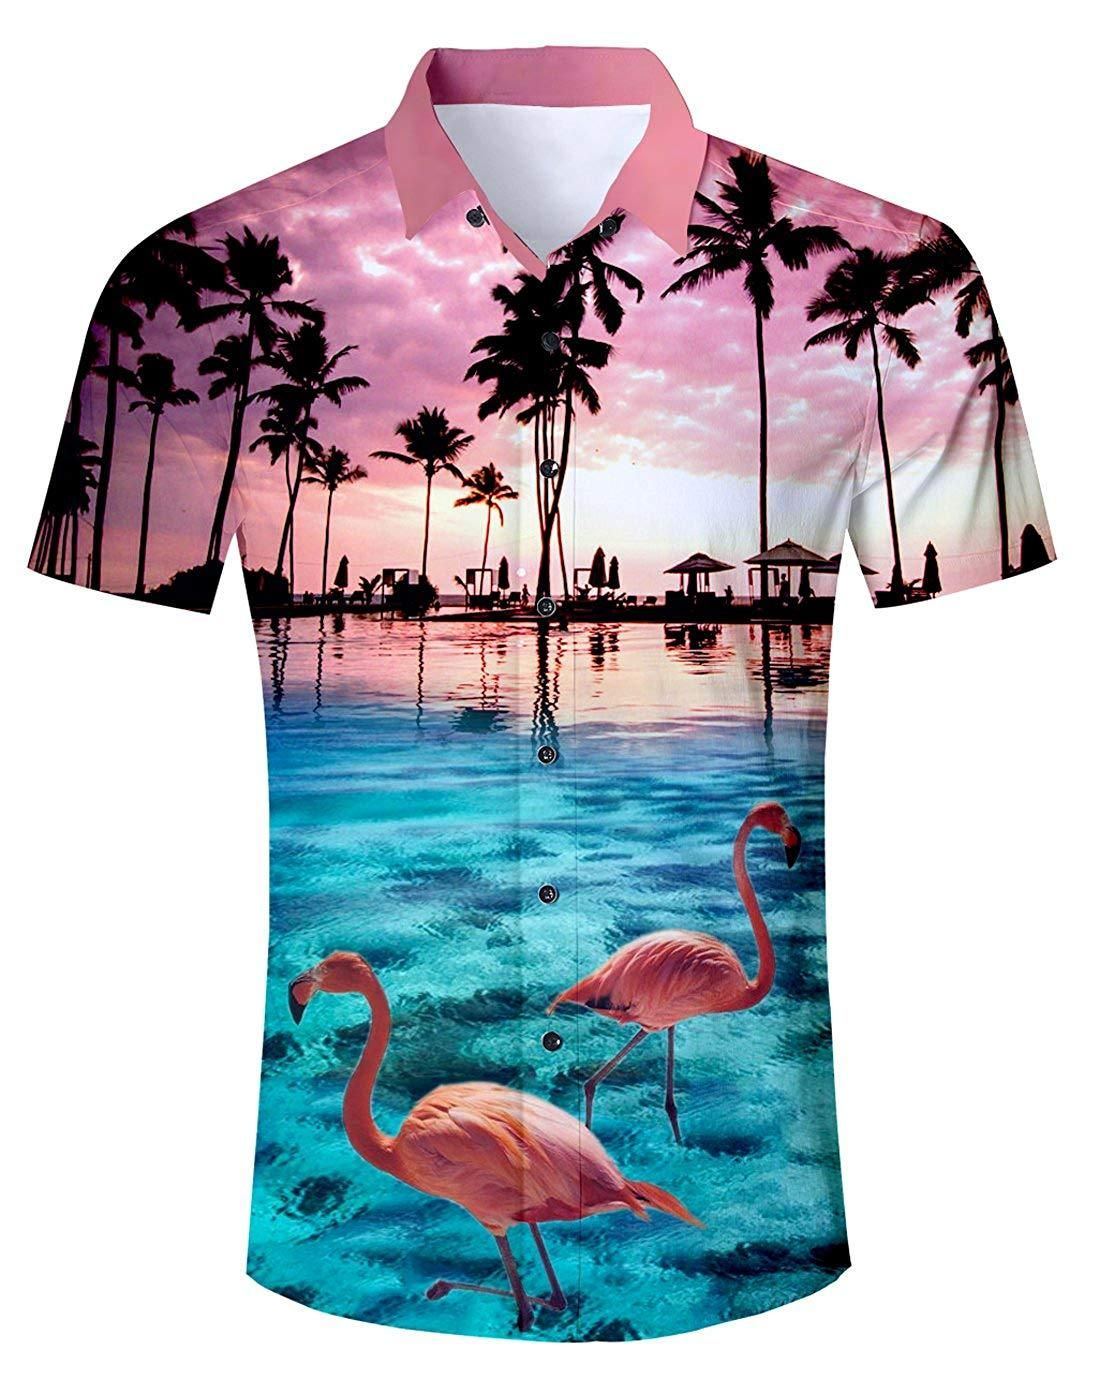 90323fb7b Uideazone Men Summer Button Down 3D Printed Aloha Shirt Casual Short Sleeve  Tropical Beach Hawaiian Shirts